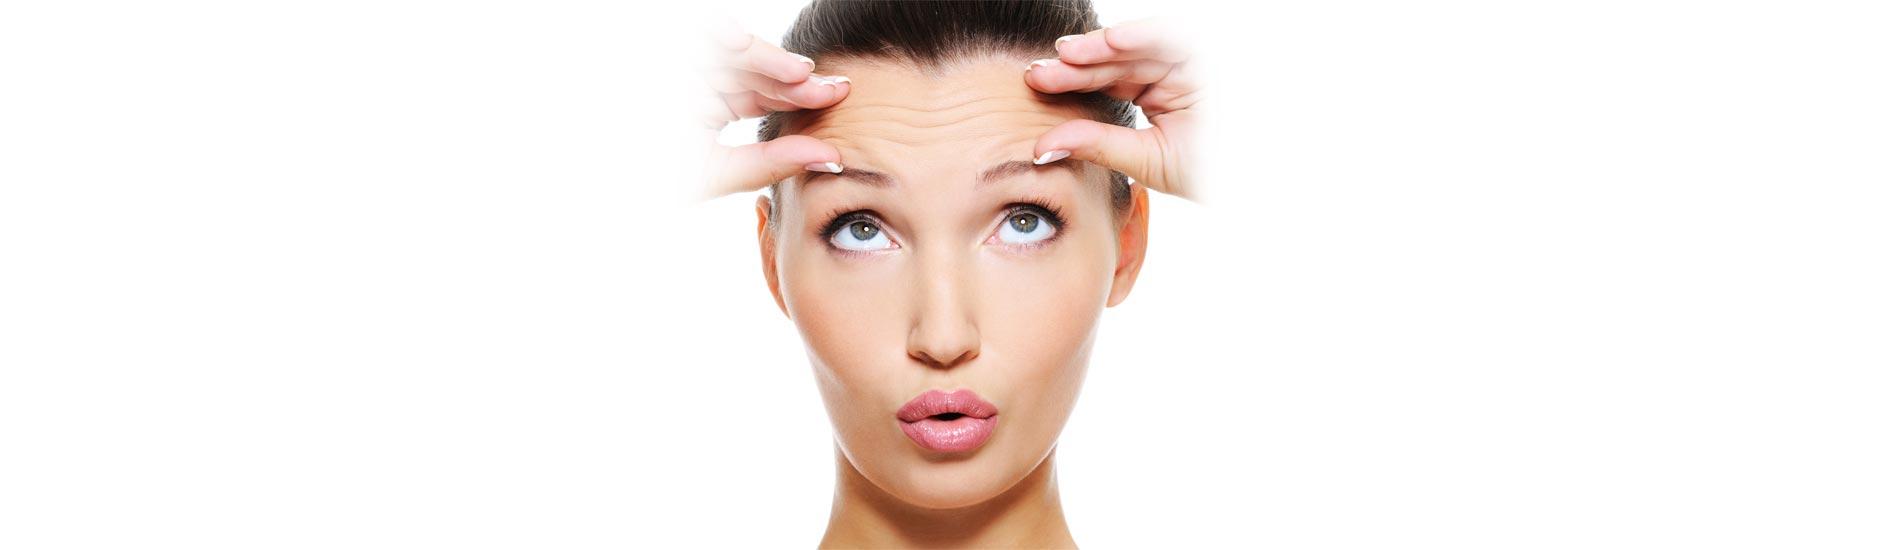 Hautarztpraxis am Roseneck - Stirnfalte (Botulinum)